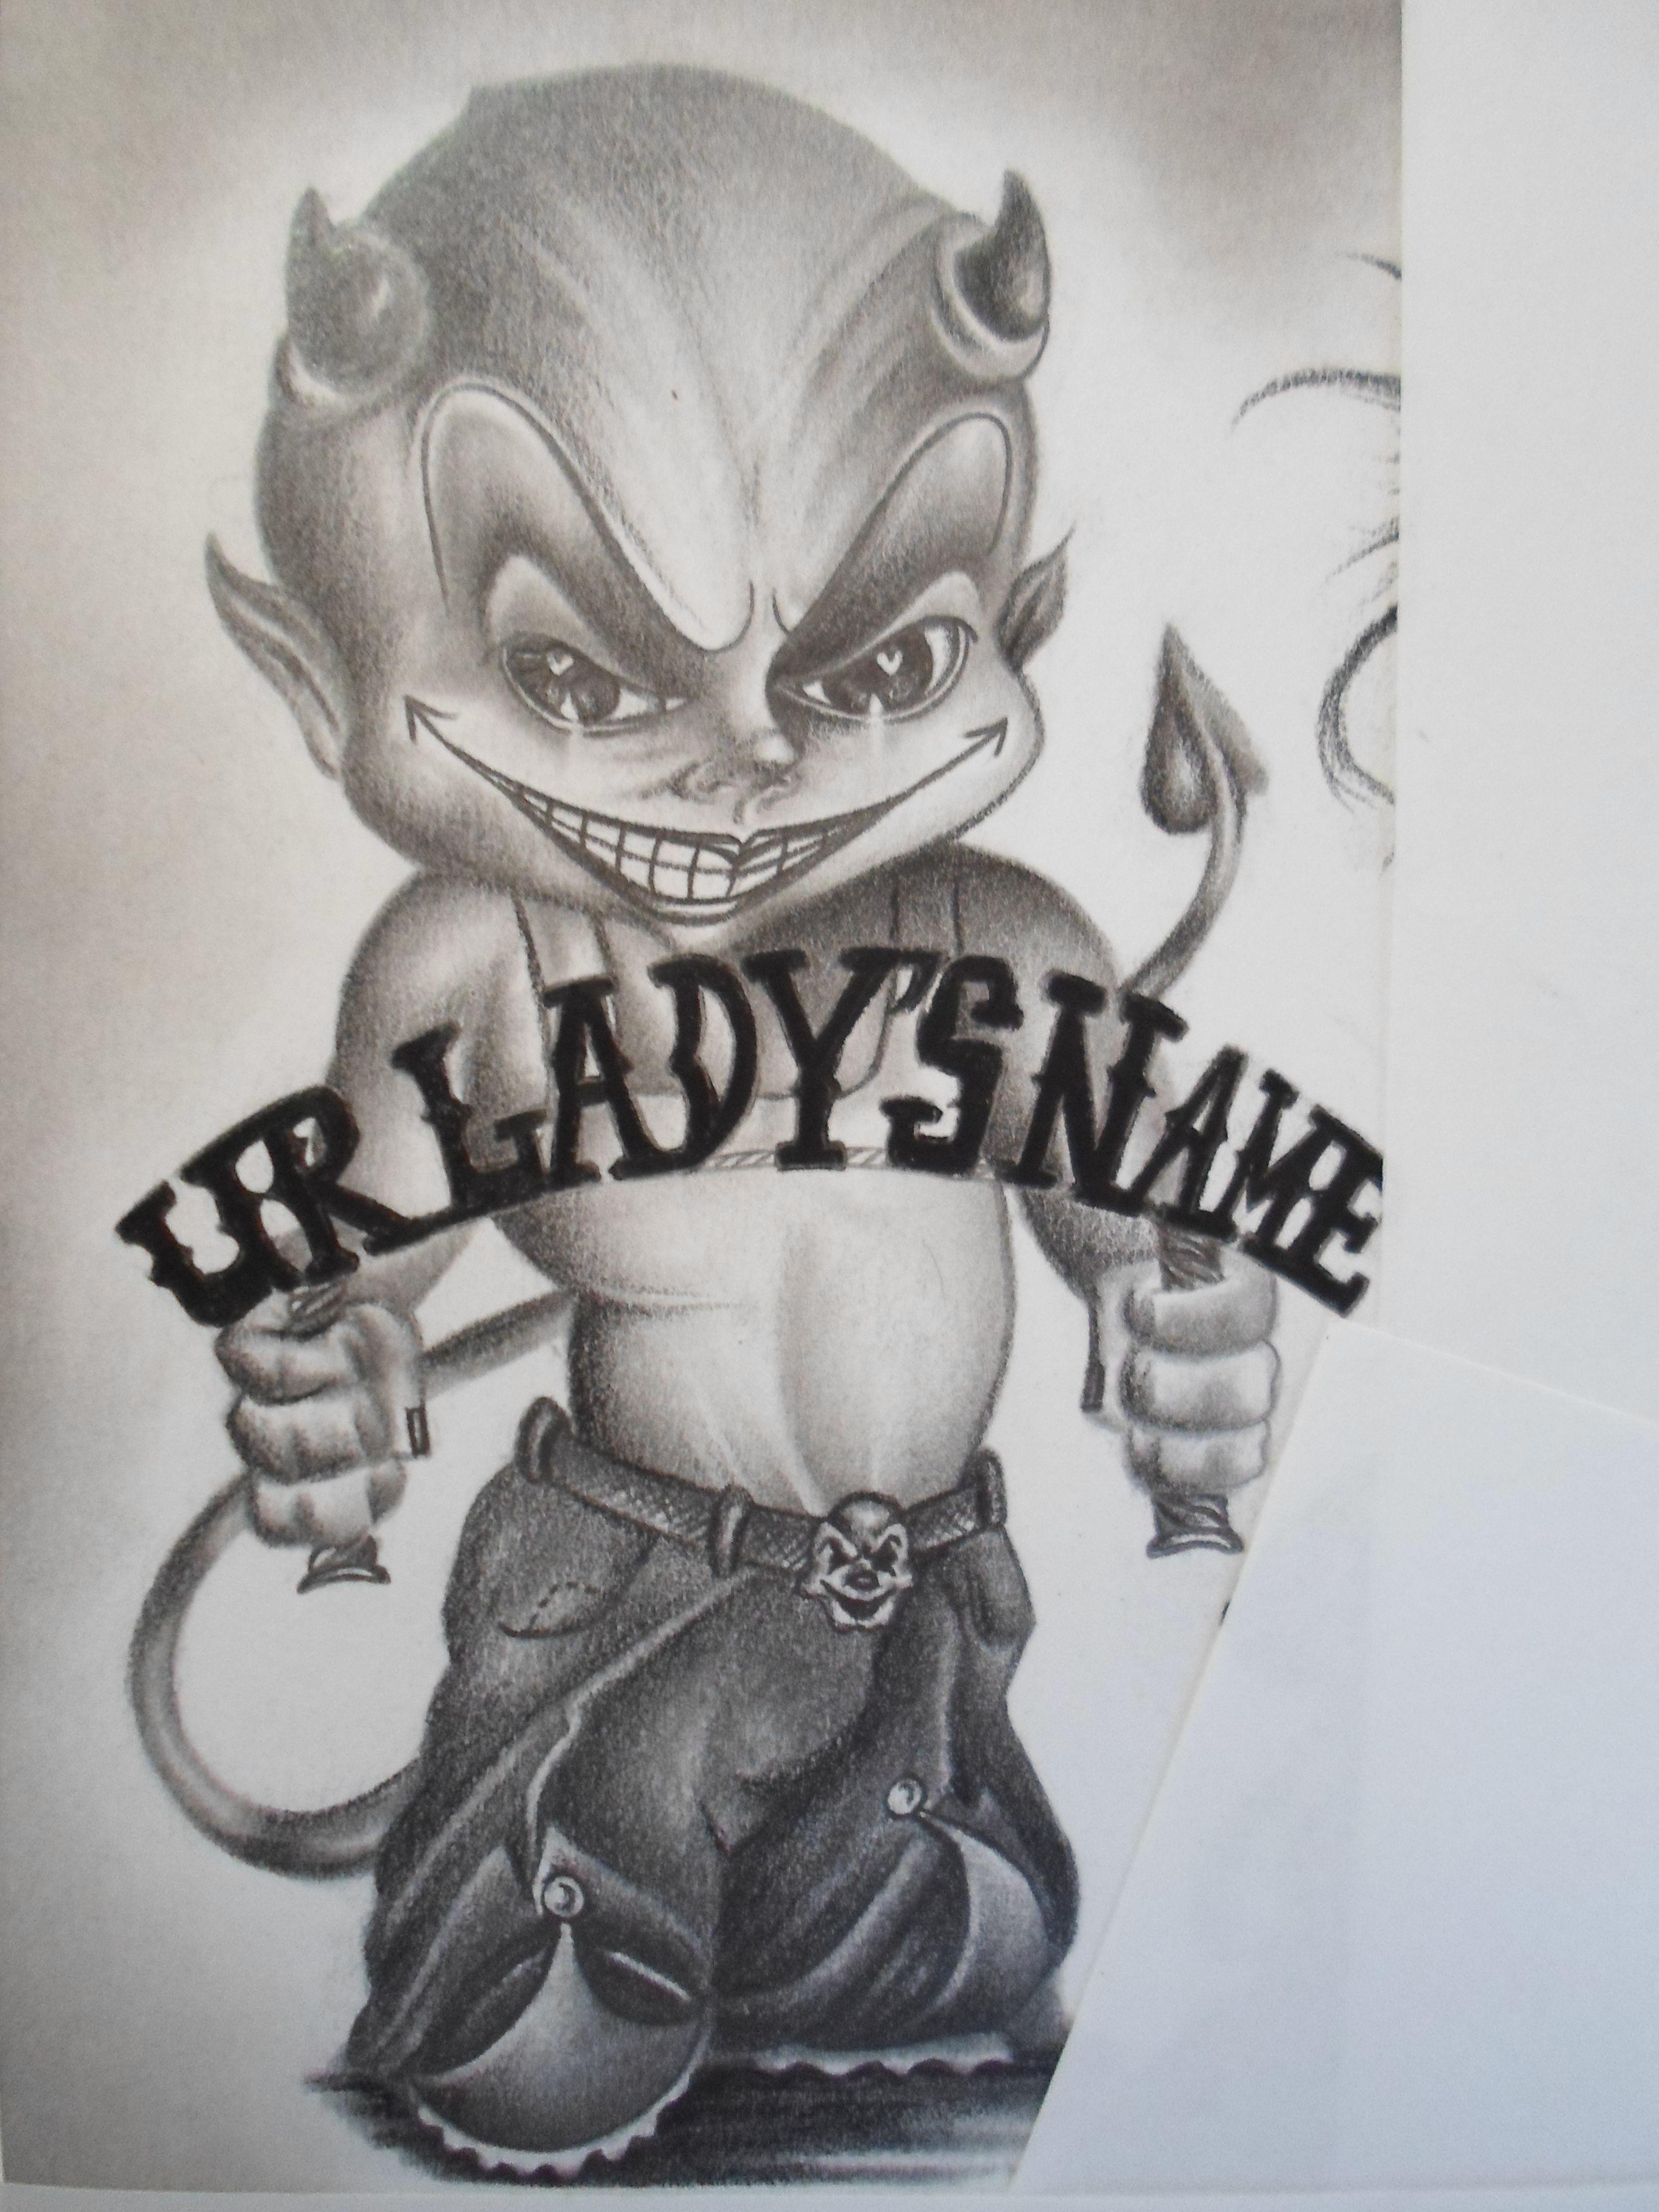 lowrider arte chicano art clowns jokers devils cool